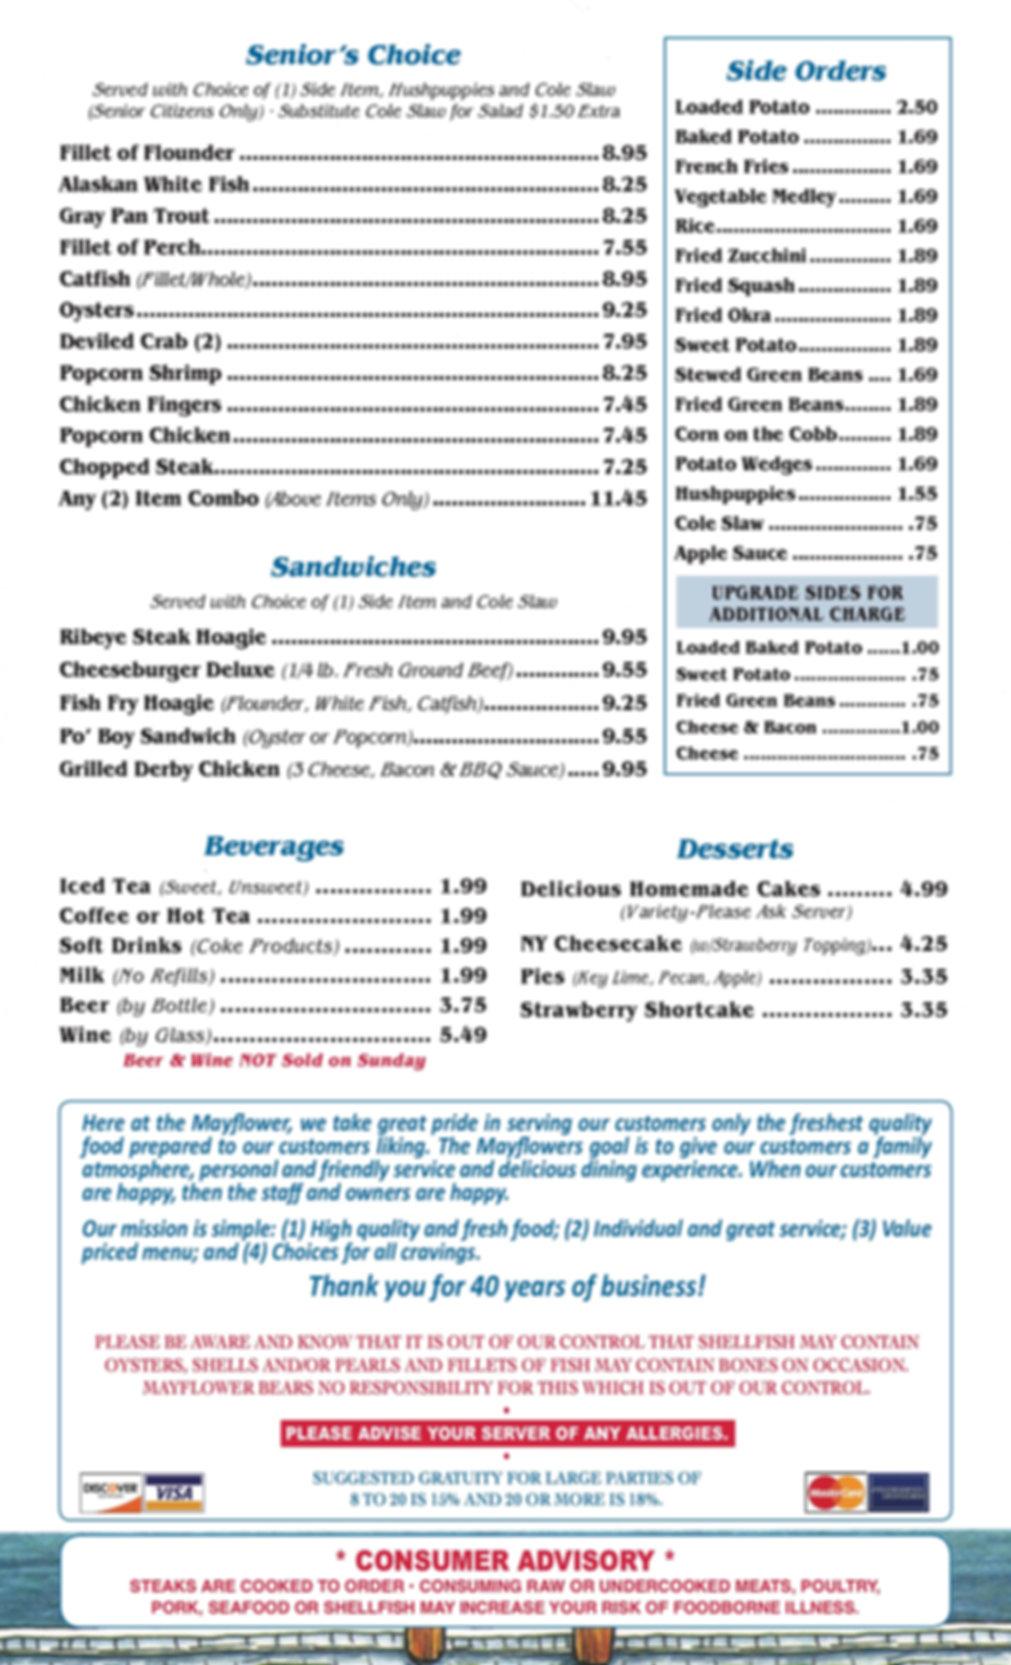 RH-DINNER Menu Panels (8.5x14)5.jpg